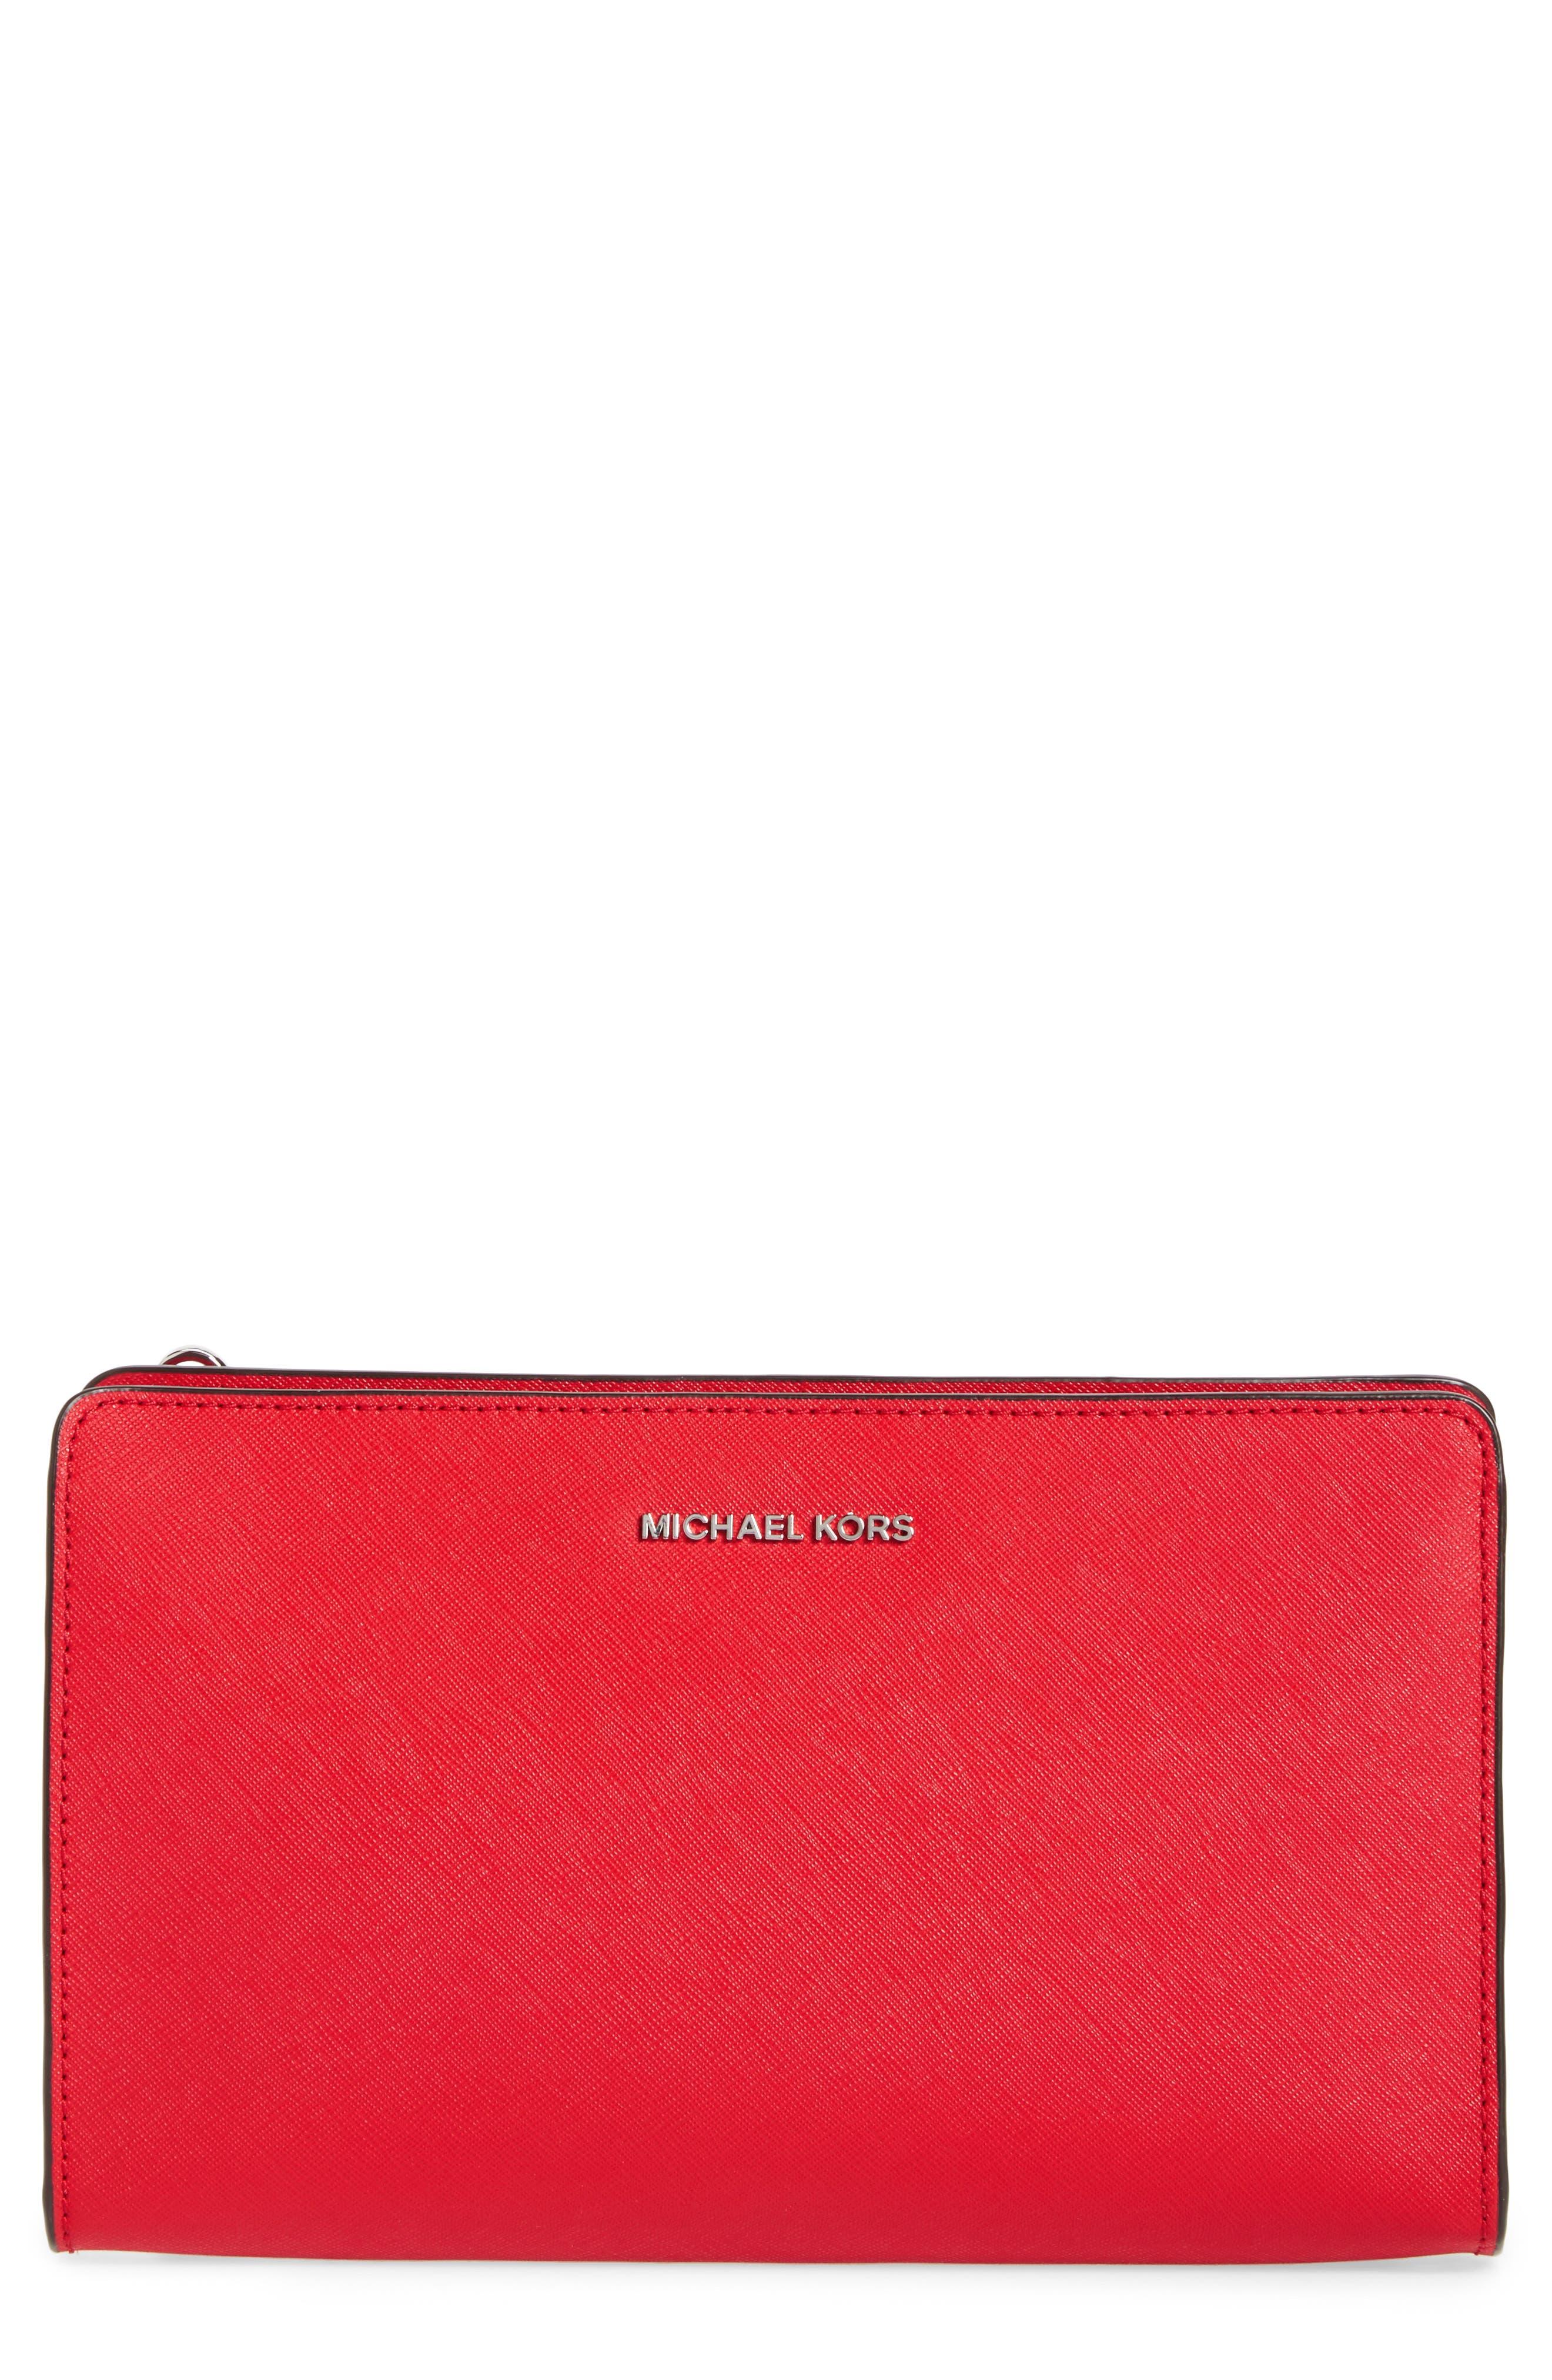 'Large Jet Set Travel' Crossbody Bag,                             Main thumbnail 1, color,                             Bright Red